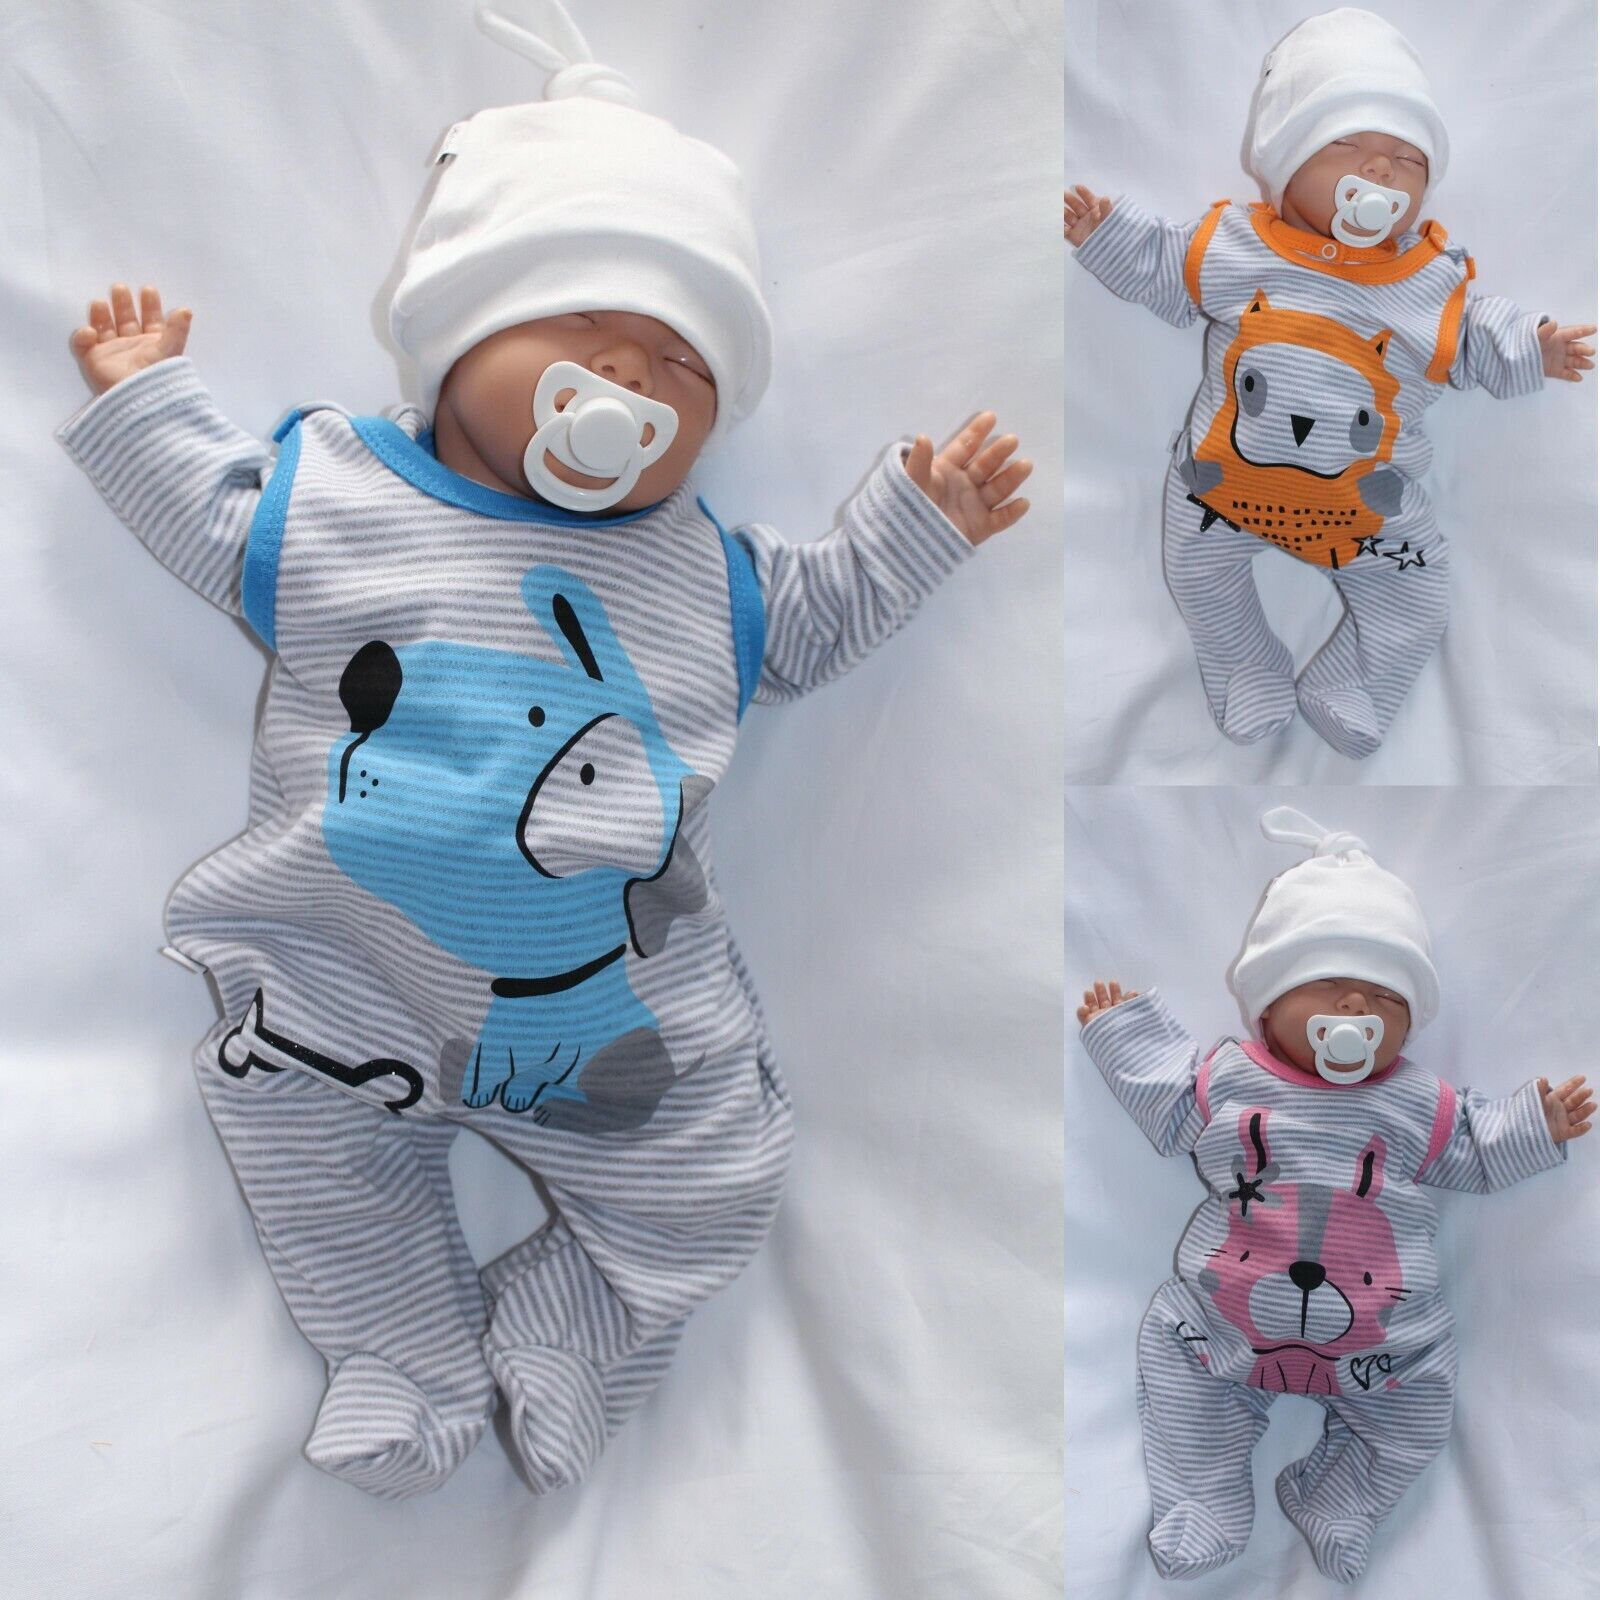 Babyset Sommer T-shirt Grün Rosa 3tlg Mädchen 62 68 74 80 Starterset Baumwolle Baby & Toddler Clothing